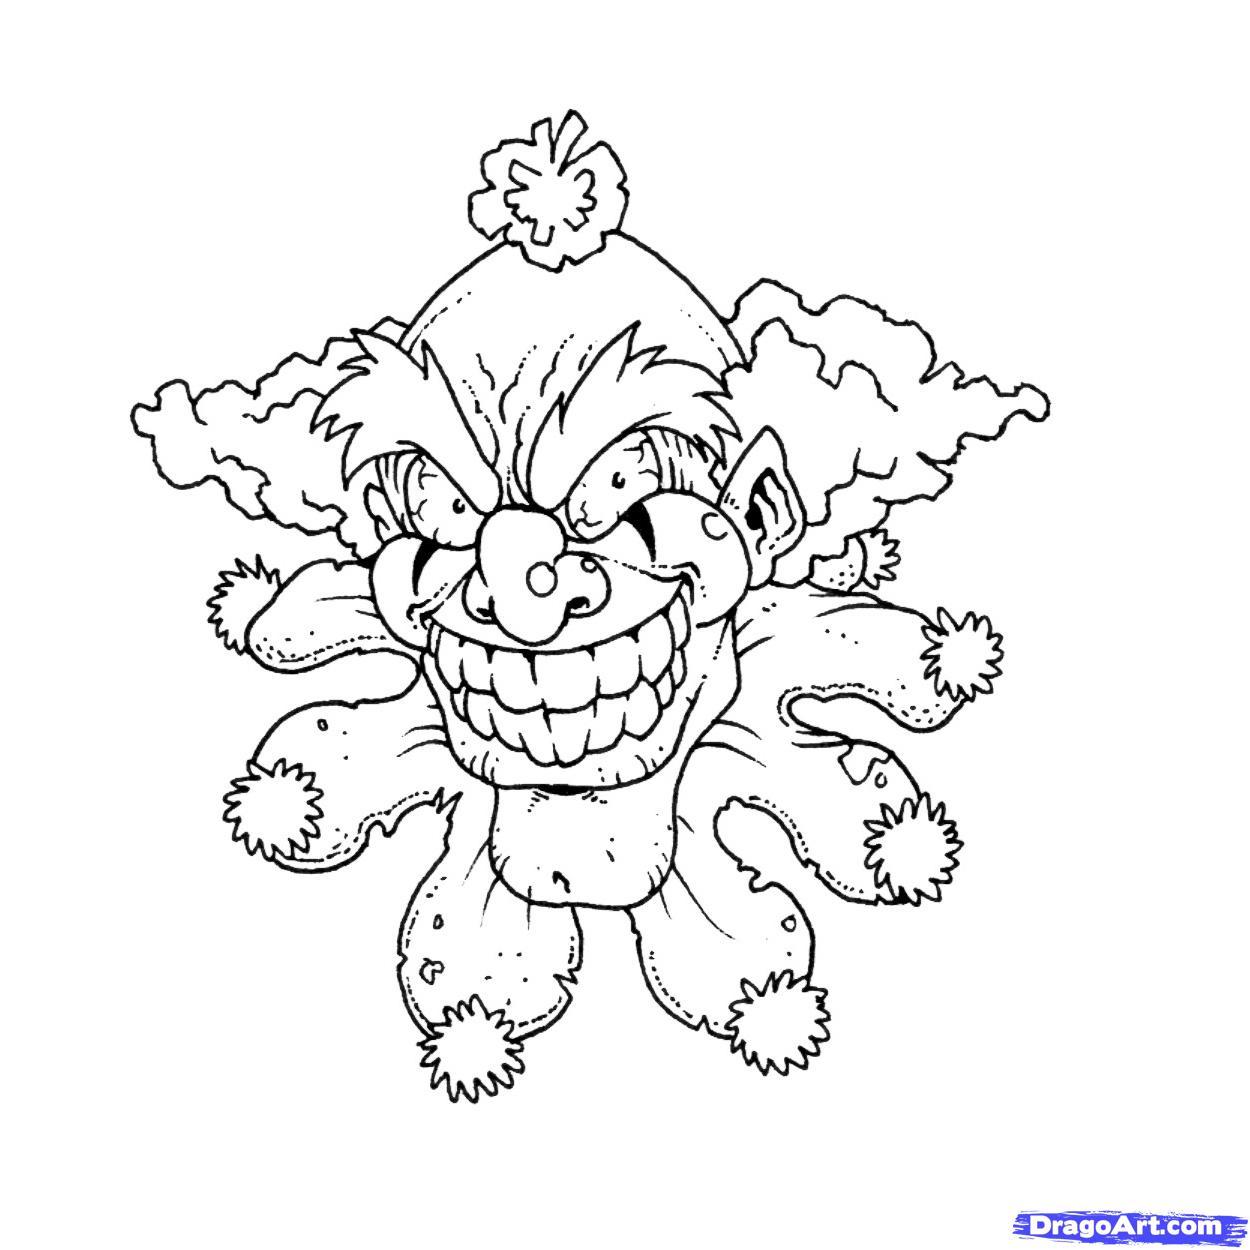 Clown Frog coloring #7, Download drawings